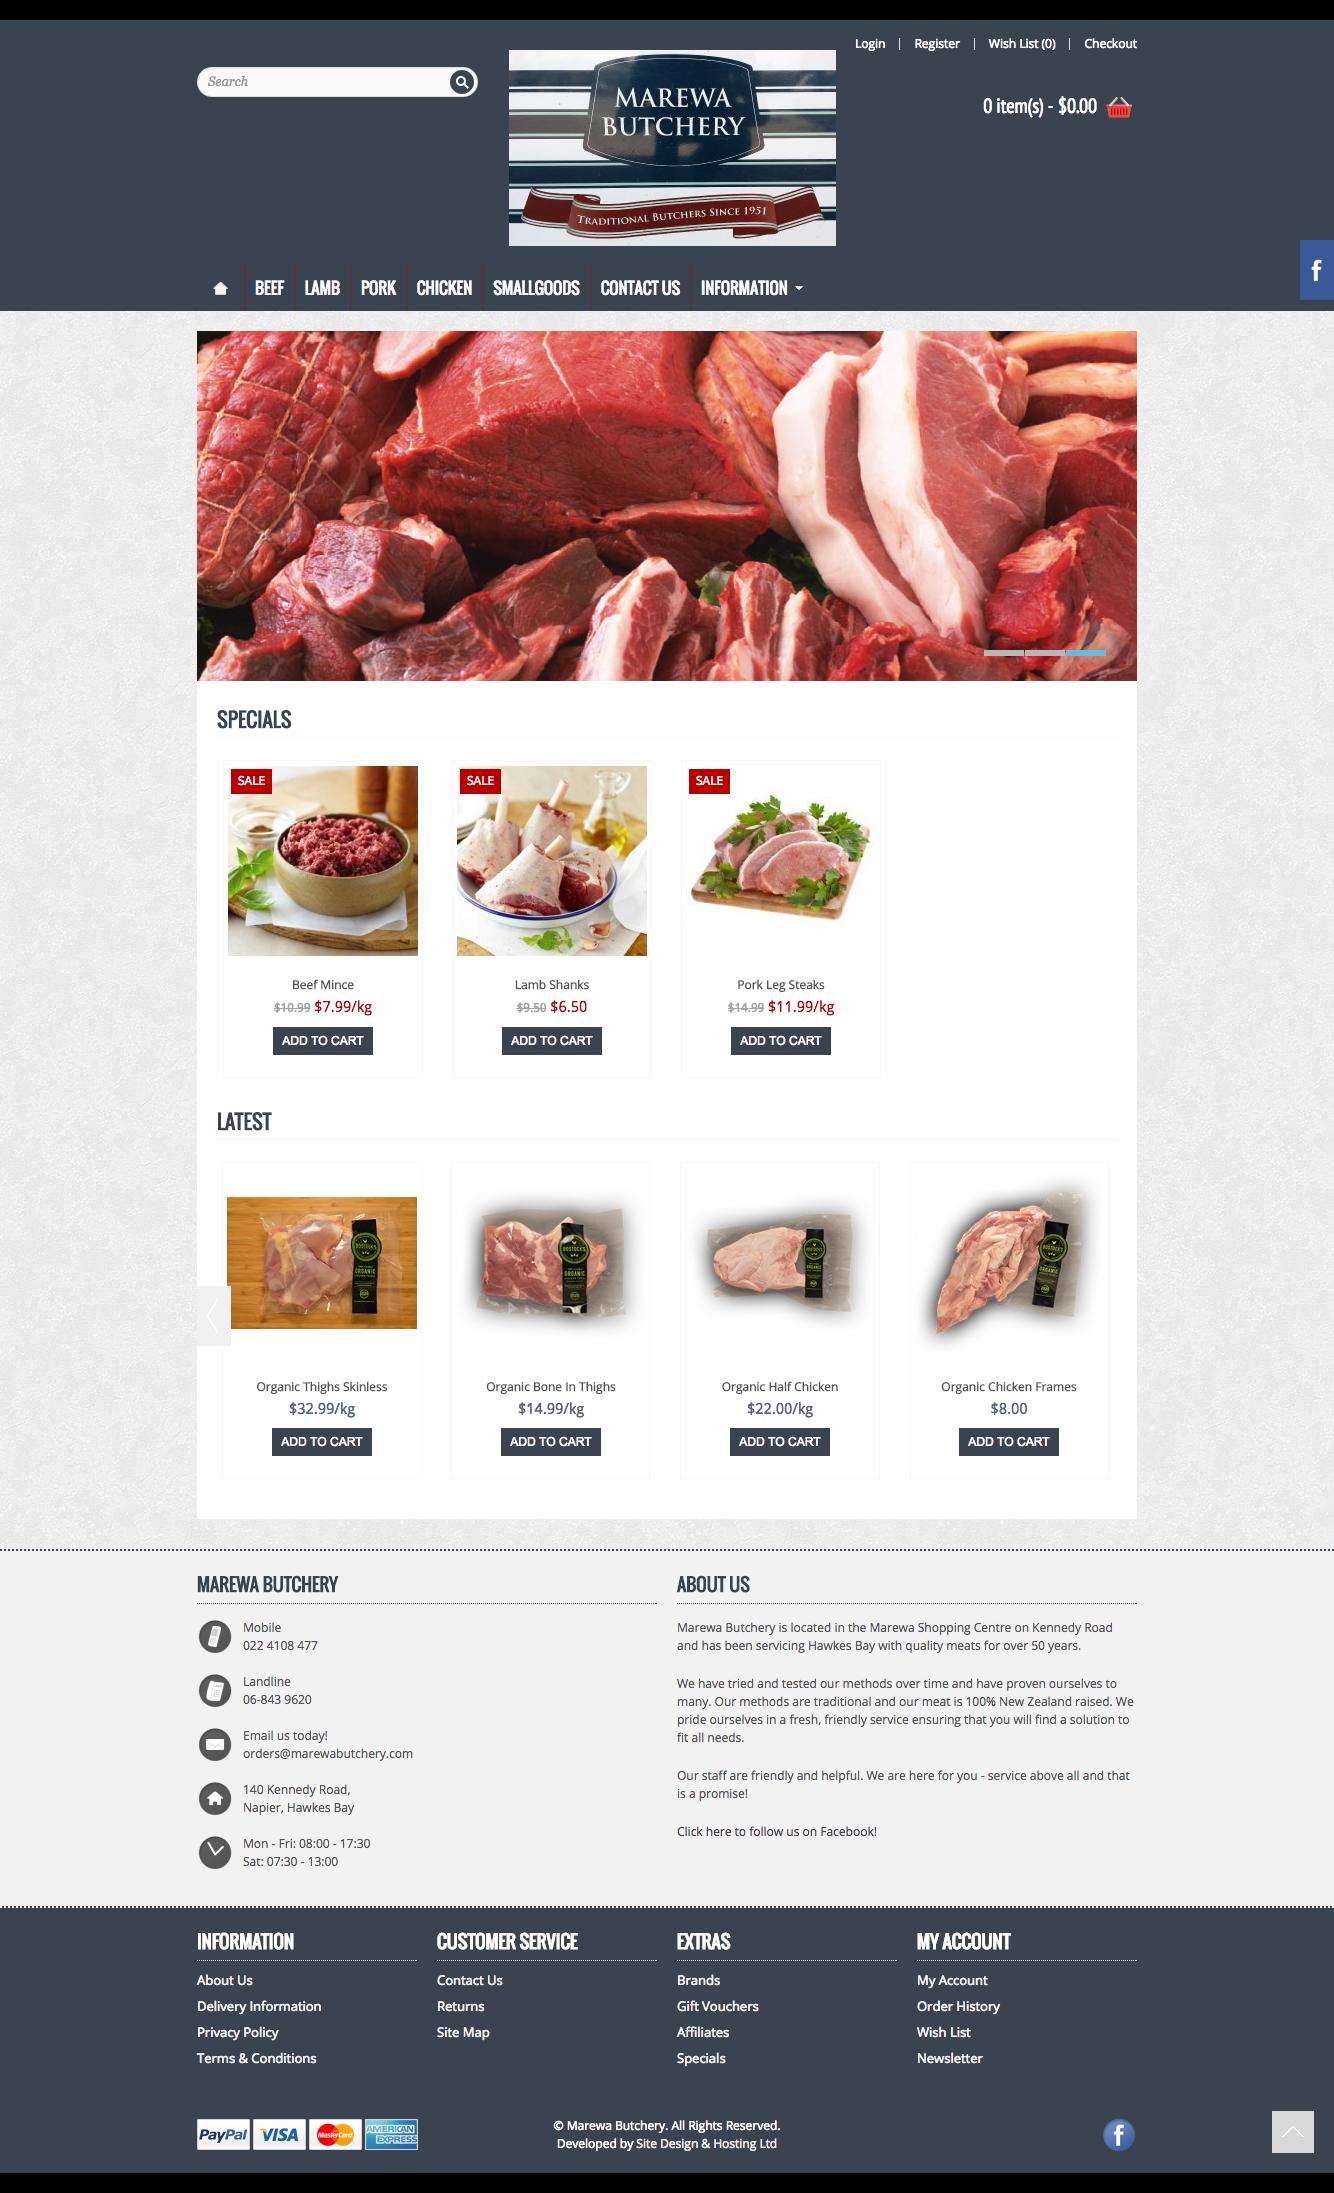 Website Design - Marewa Butchery